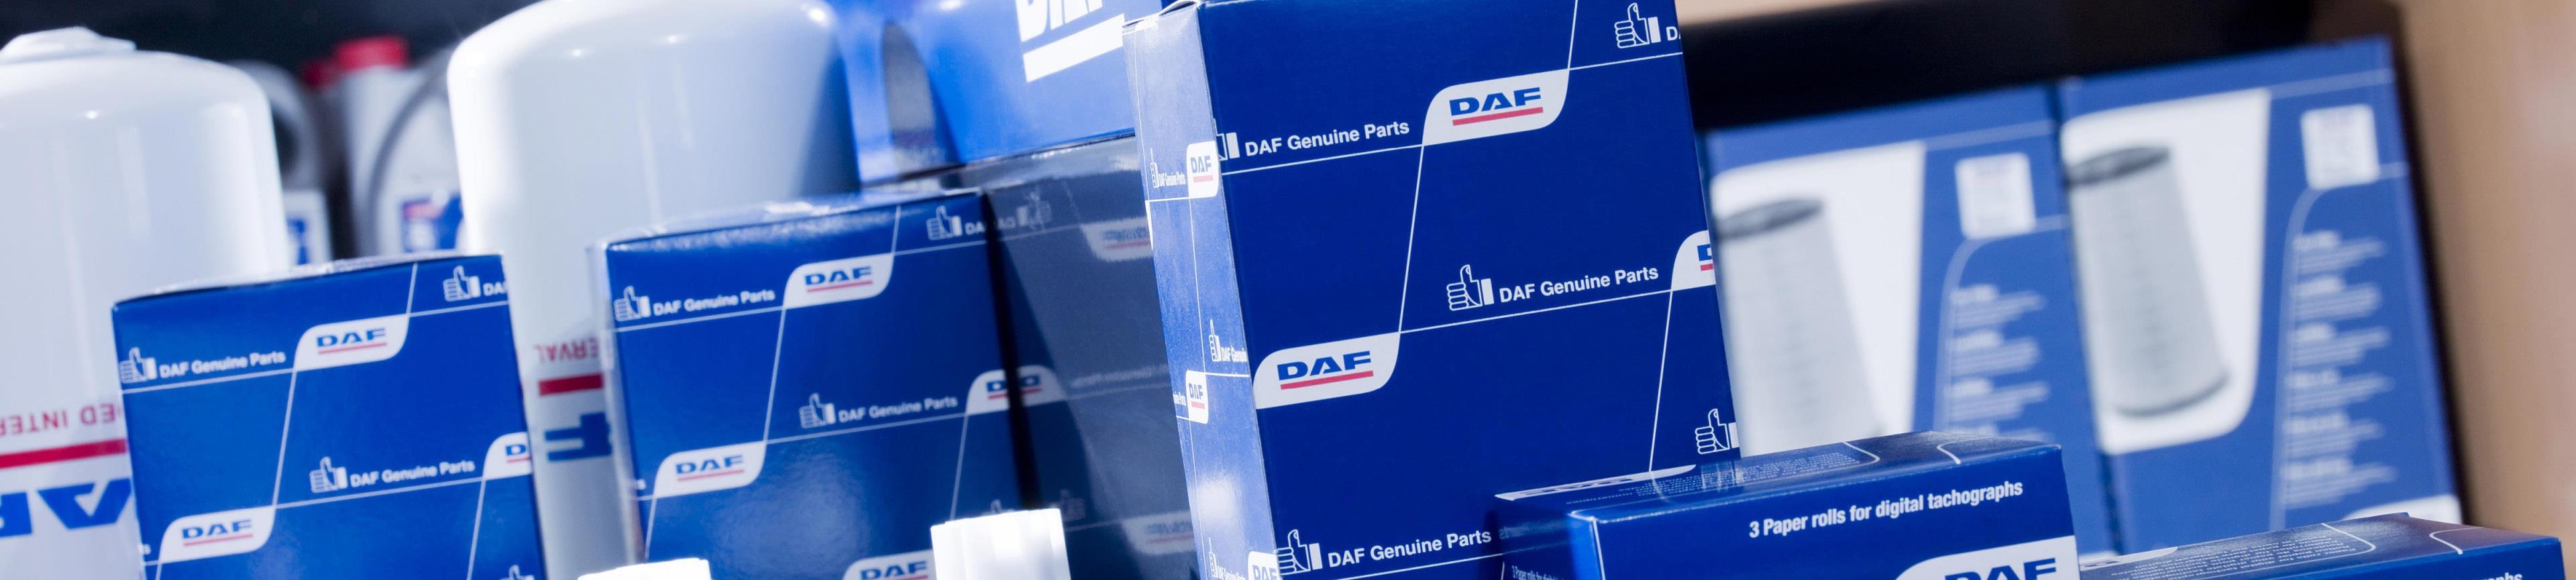 Uitgelezene DAF Originele Onderdelen - DAF Nederland RI-13